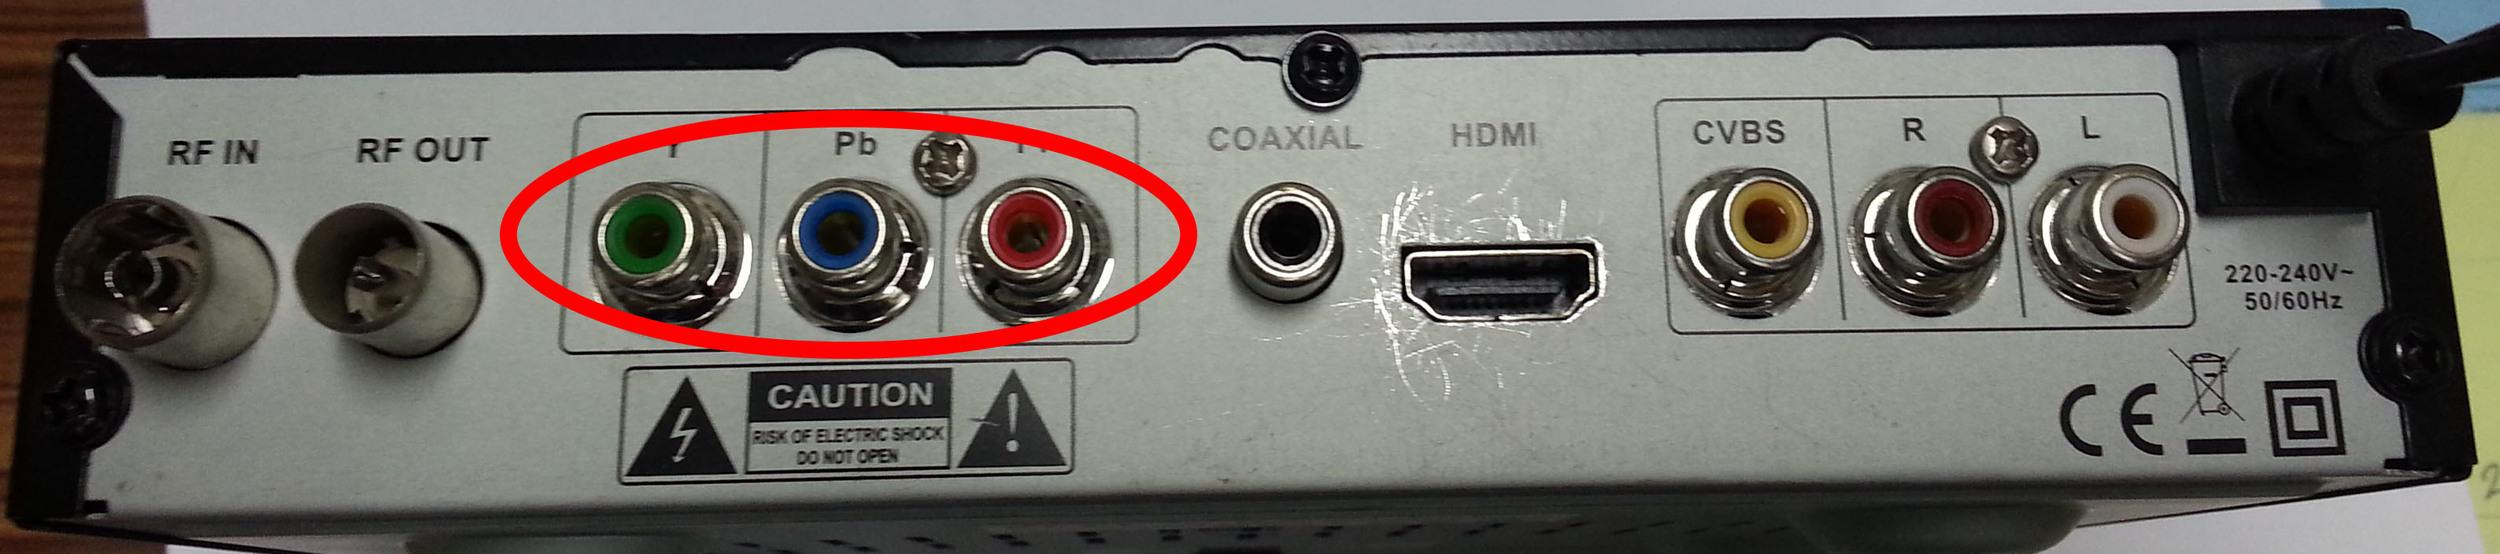 BETA HD-T2 First Gen. (สังเกตุว่ามีช่อง component เขียว-ฟ้า-แดง อยู่ด้านหลัง)